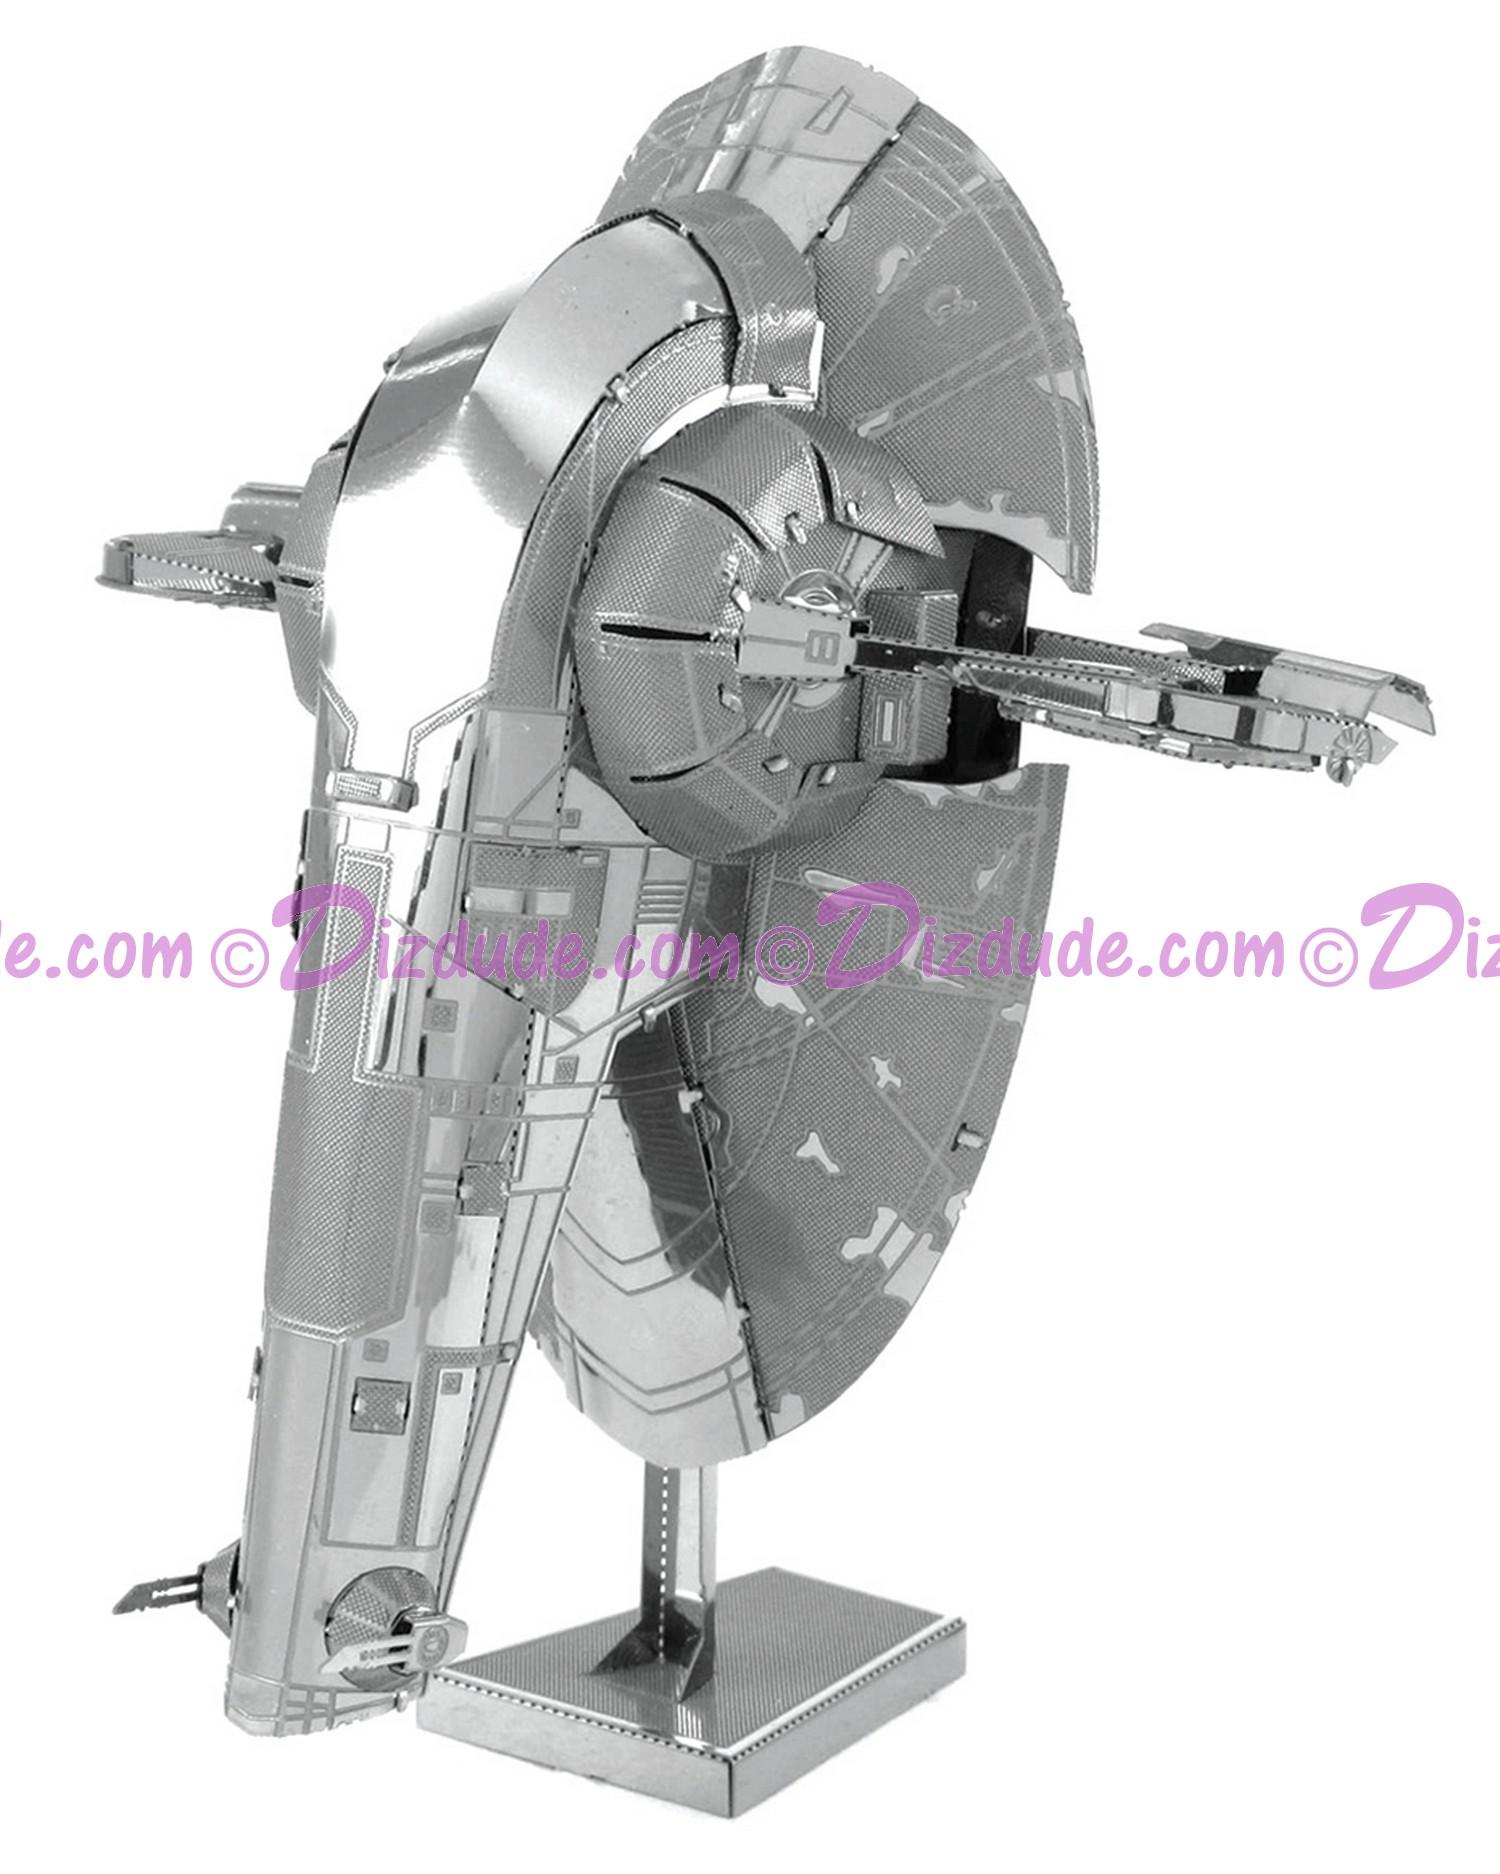 Disney Star Wars Slave 1 3D Metal Model Kit © Dizdude.com